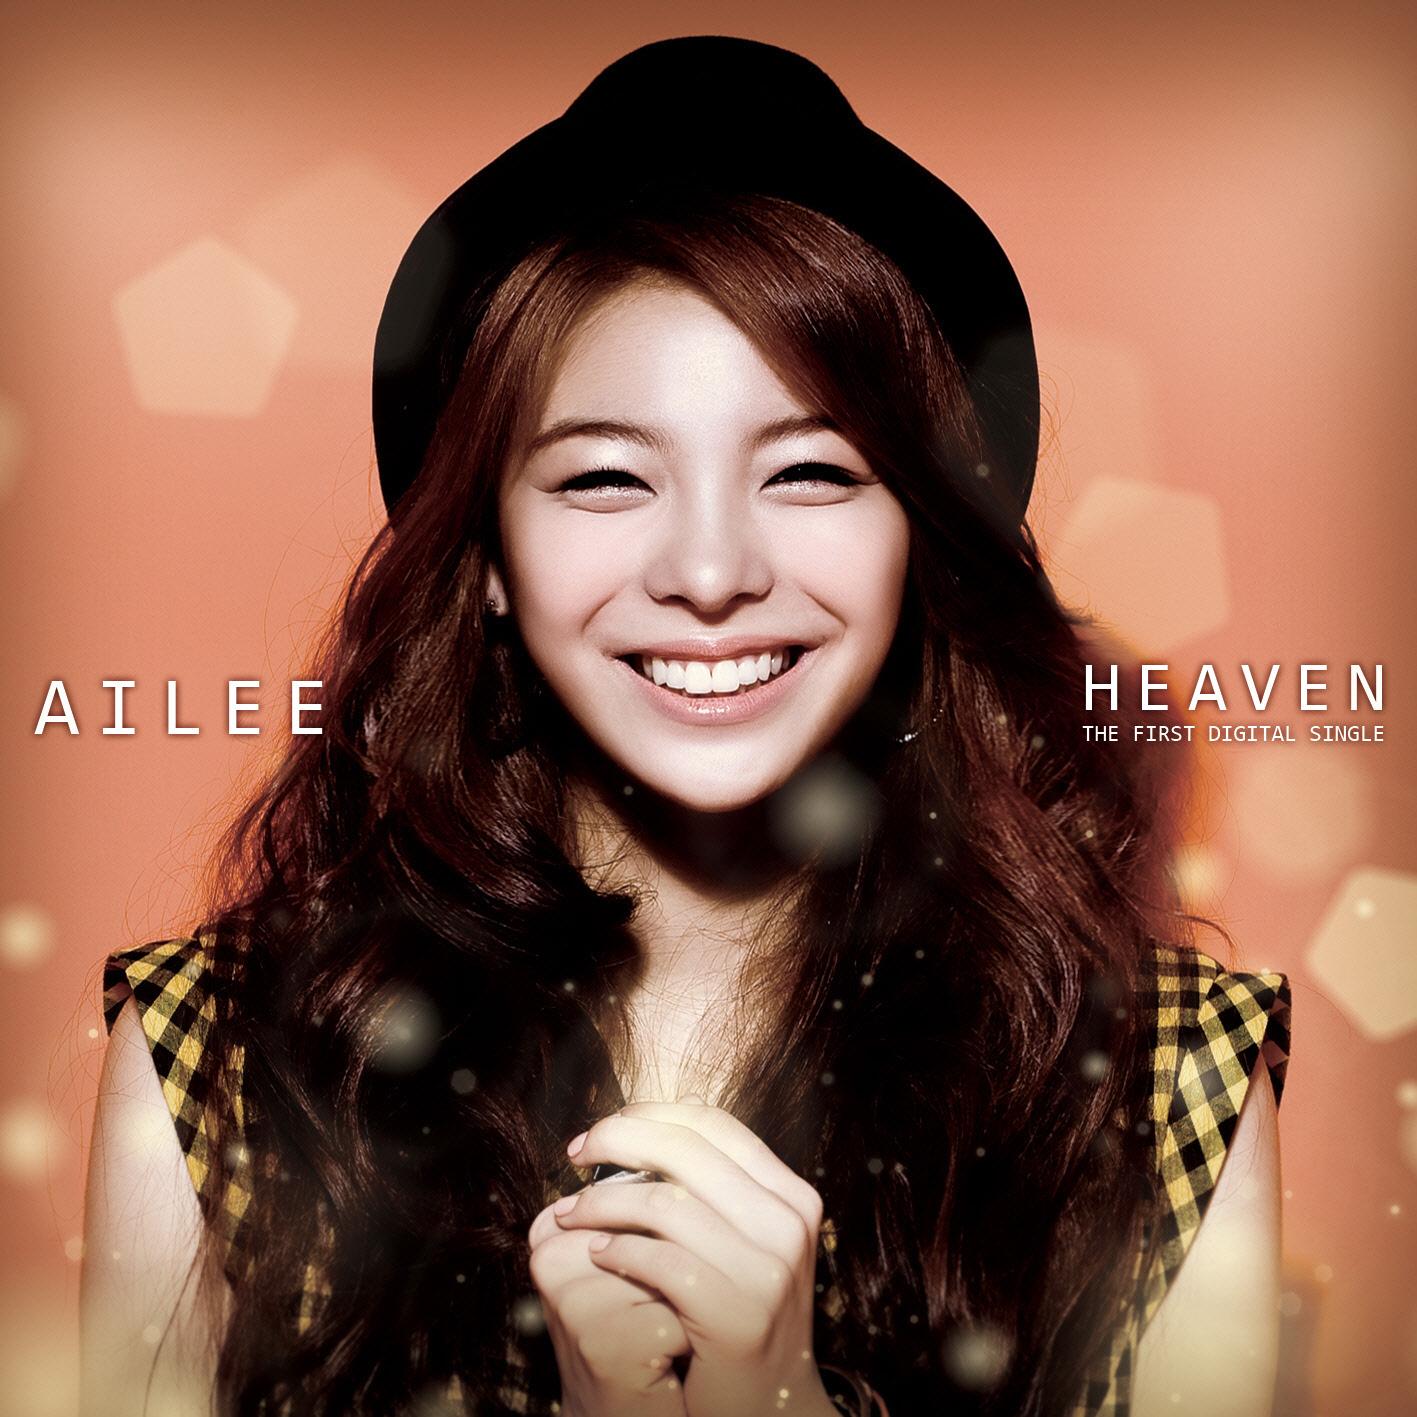 http://2.bp.blogspot.com/-WhrBirnRxME/TzKlISsVcDI/AAAAAAAABd8/ujMrWAurB1M/s1600/Ailee+Heaven.jpg